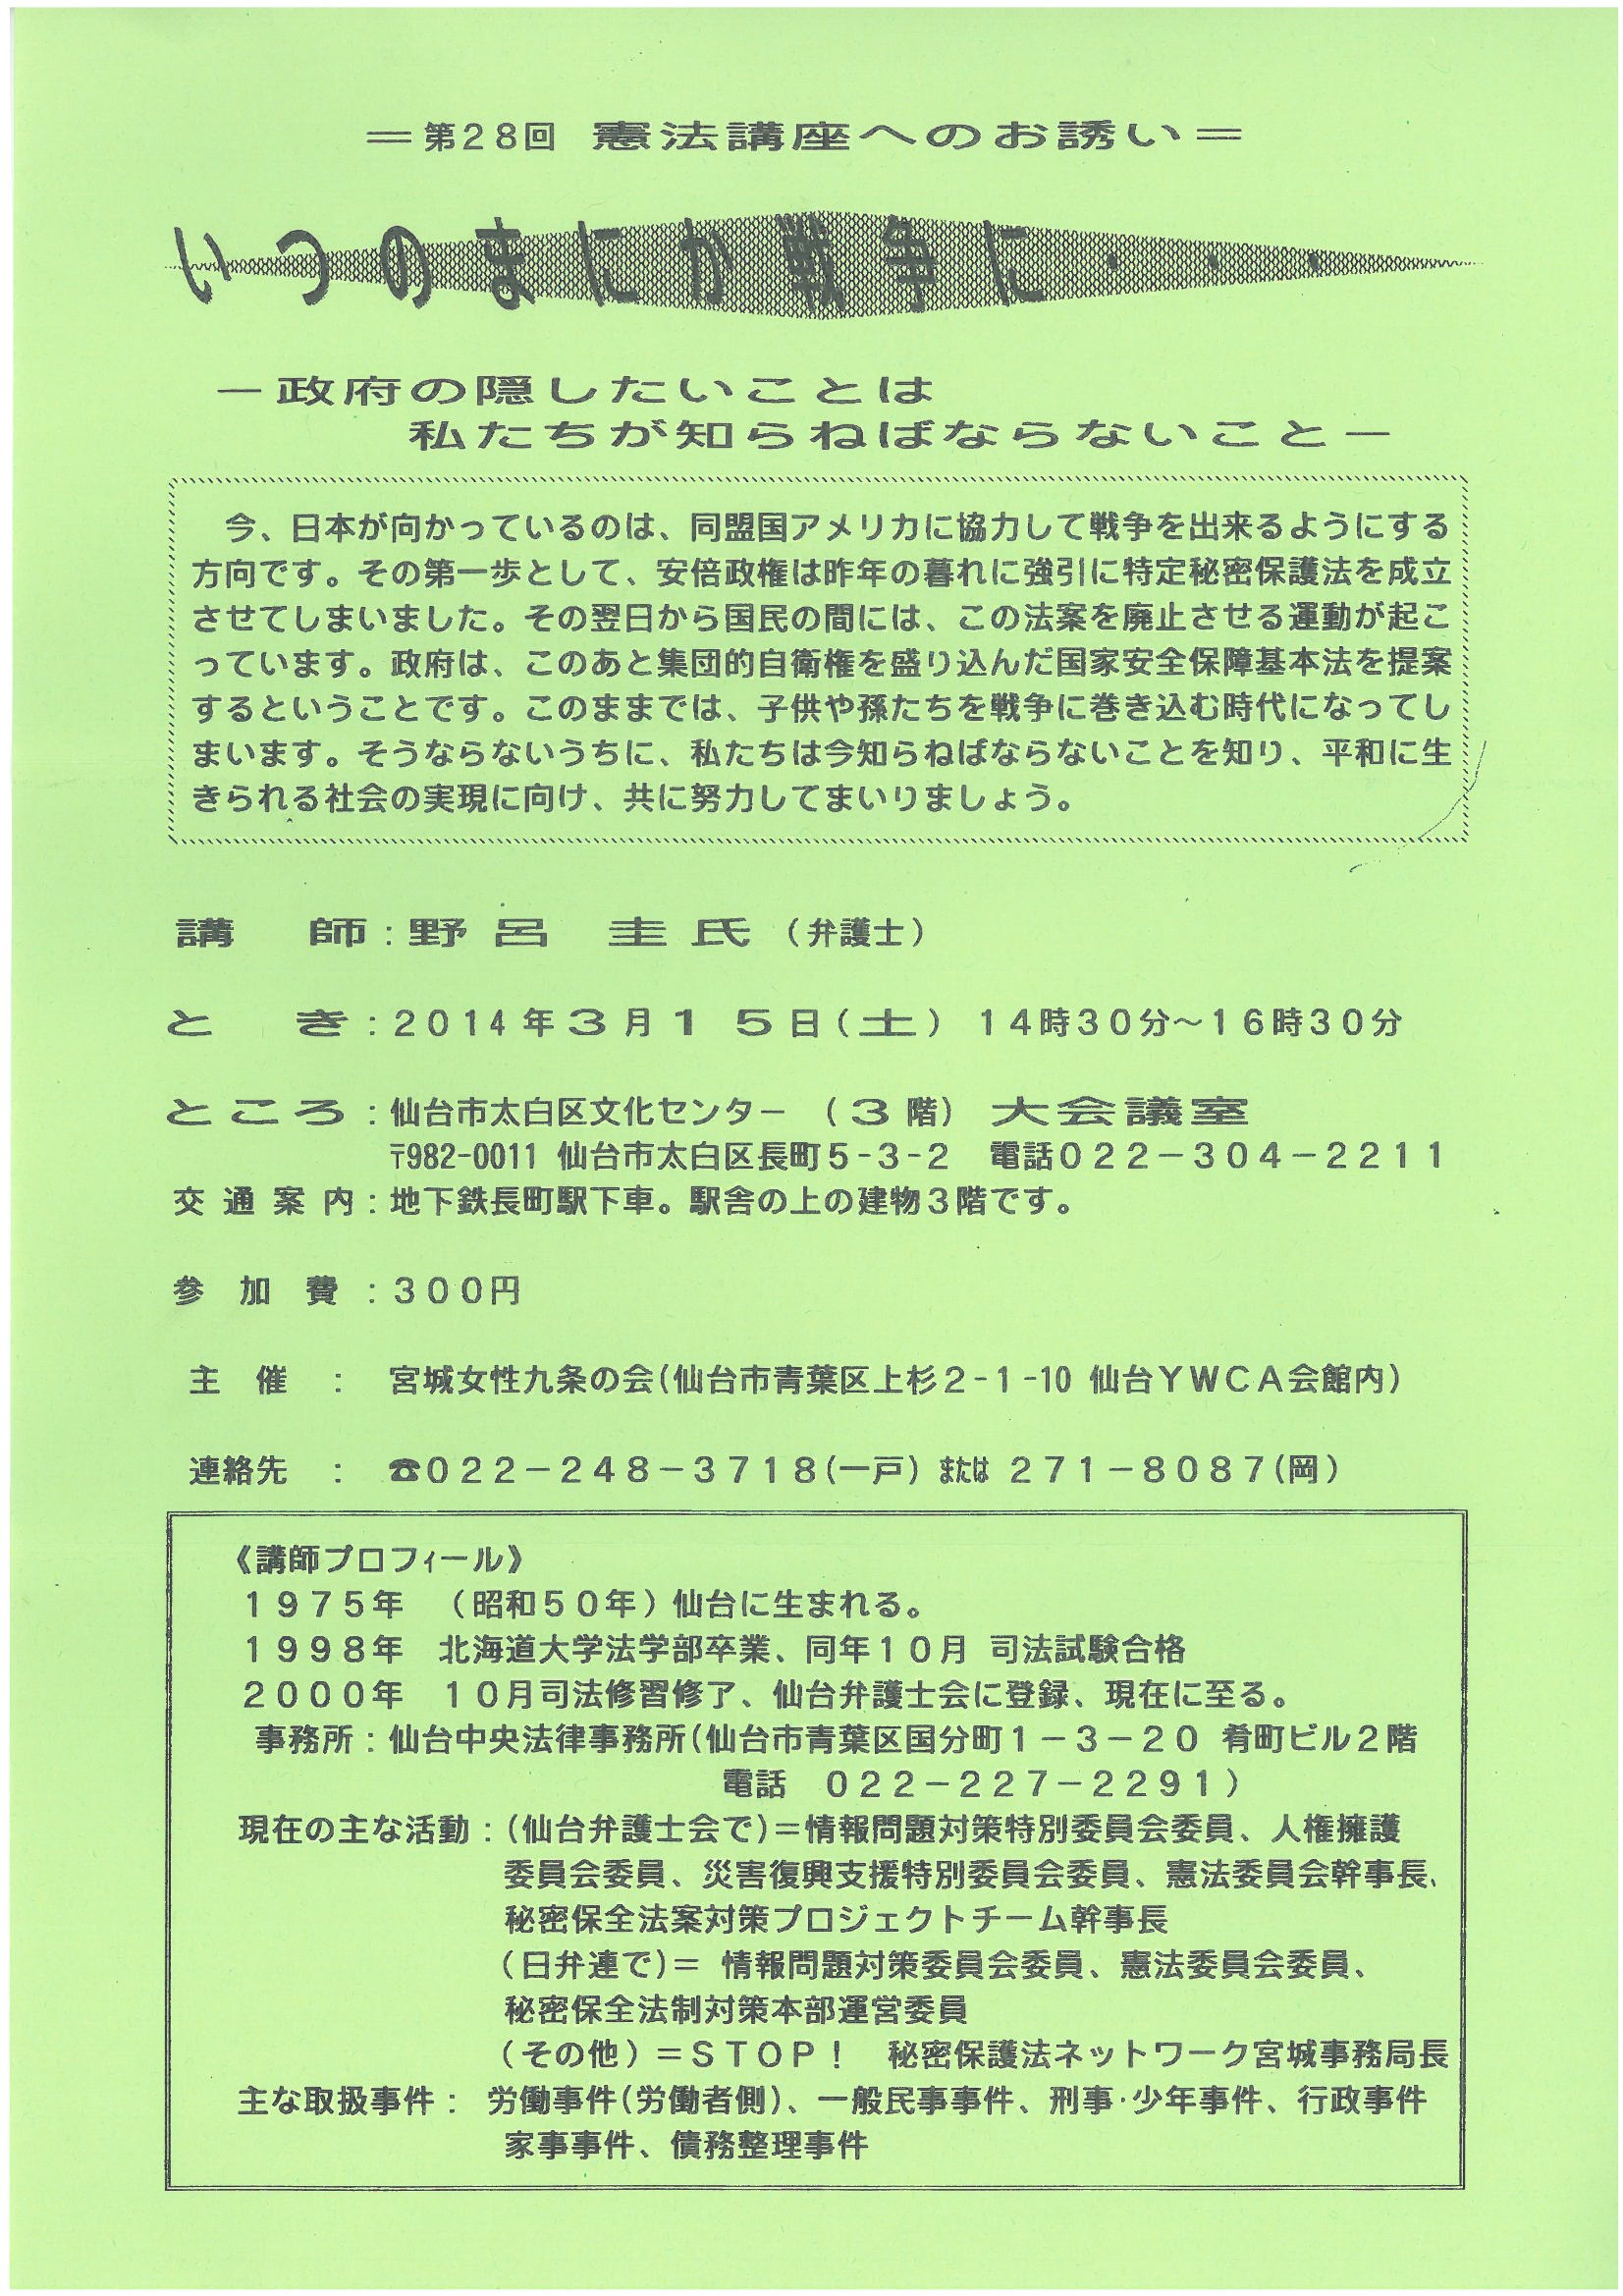 SKMBT_C22014012410590.jpg